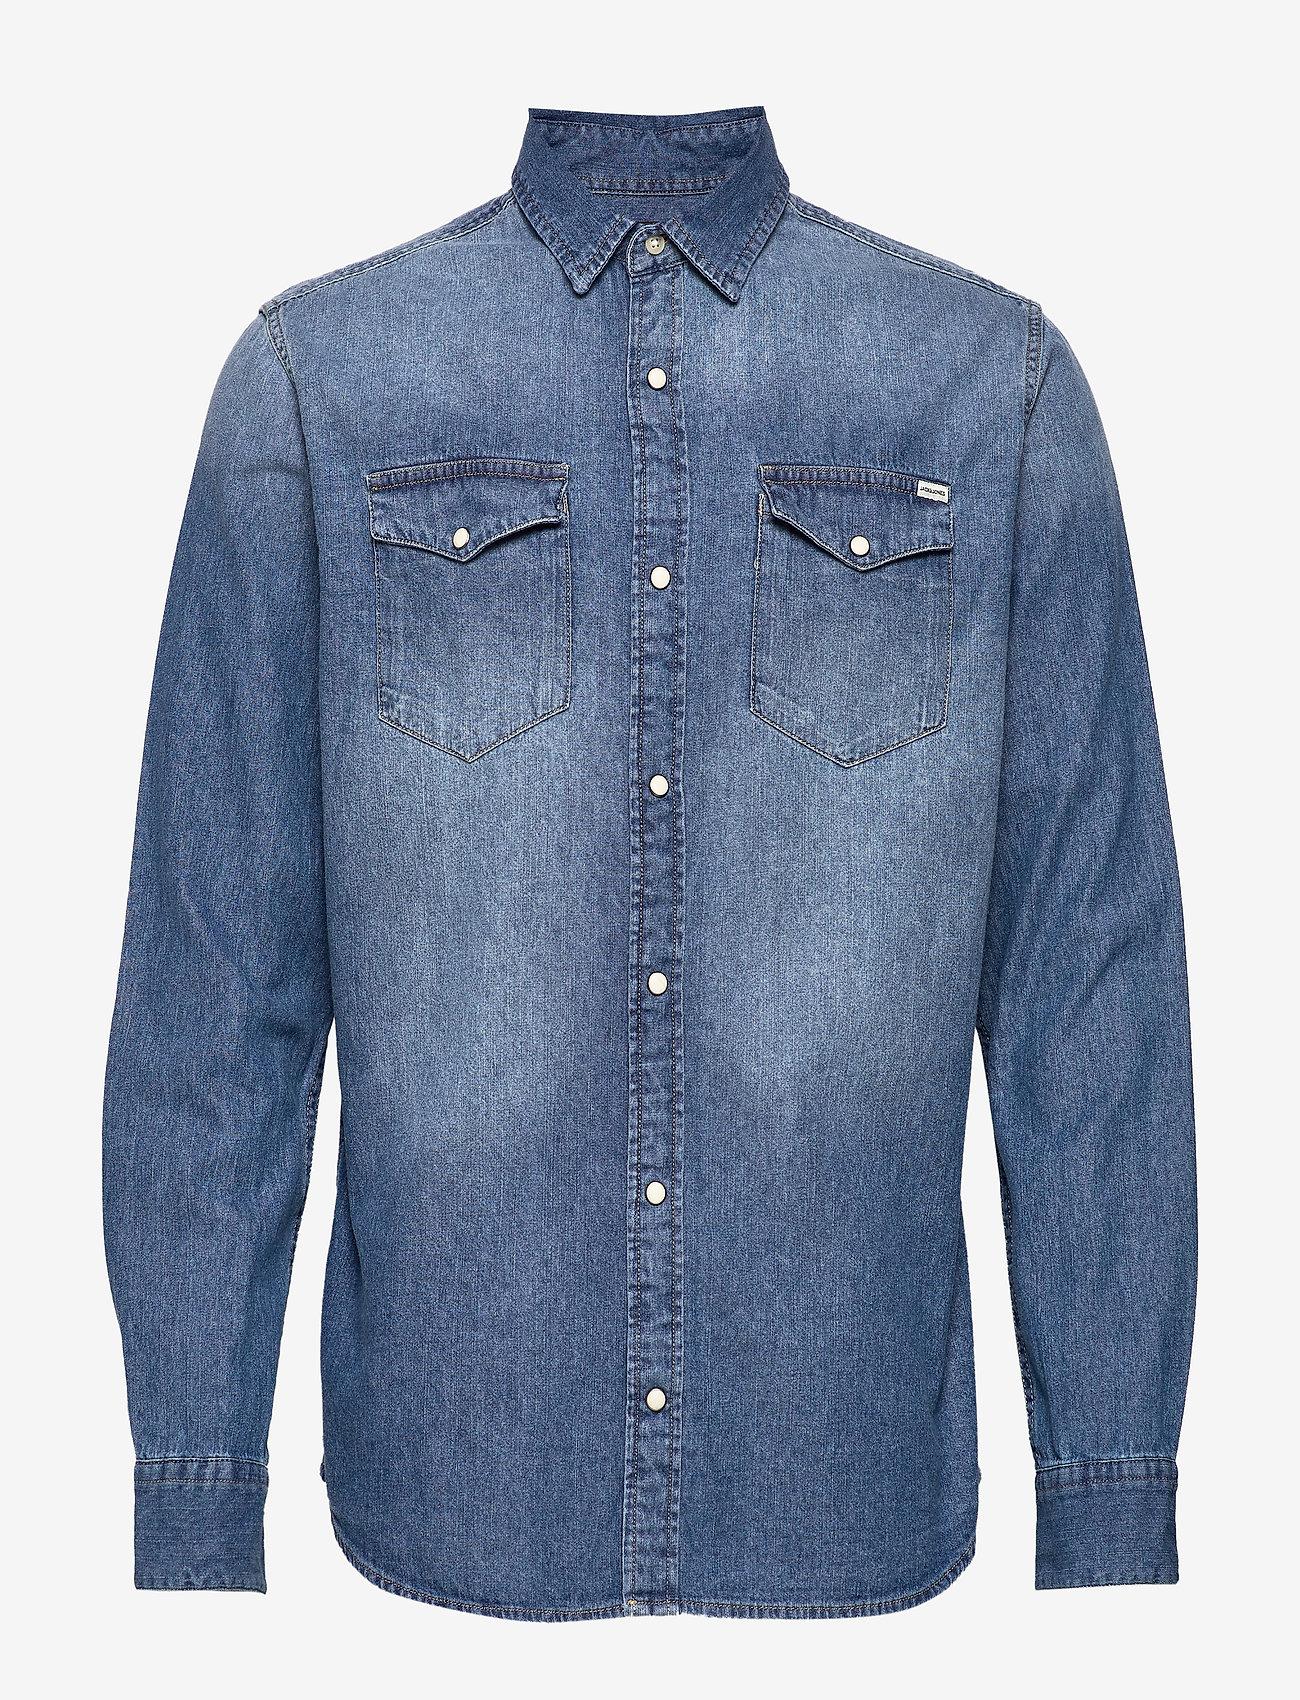 Jack & Jones - JJESHERIDAN SHIRT L/S - jeansskjortor - medium blue denim - 0